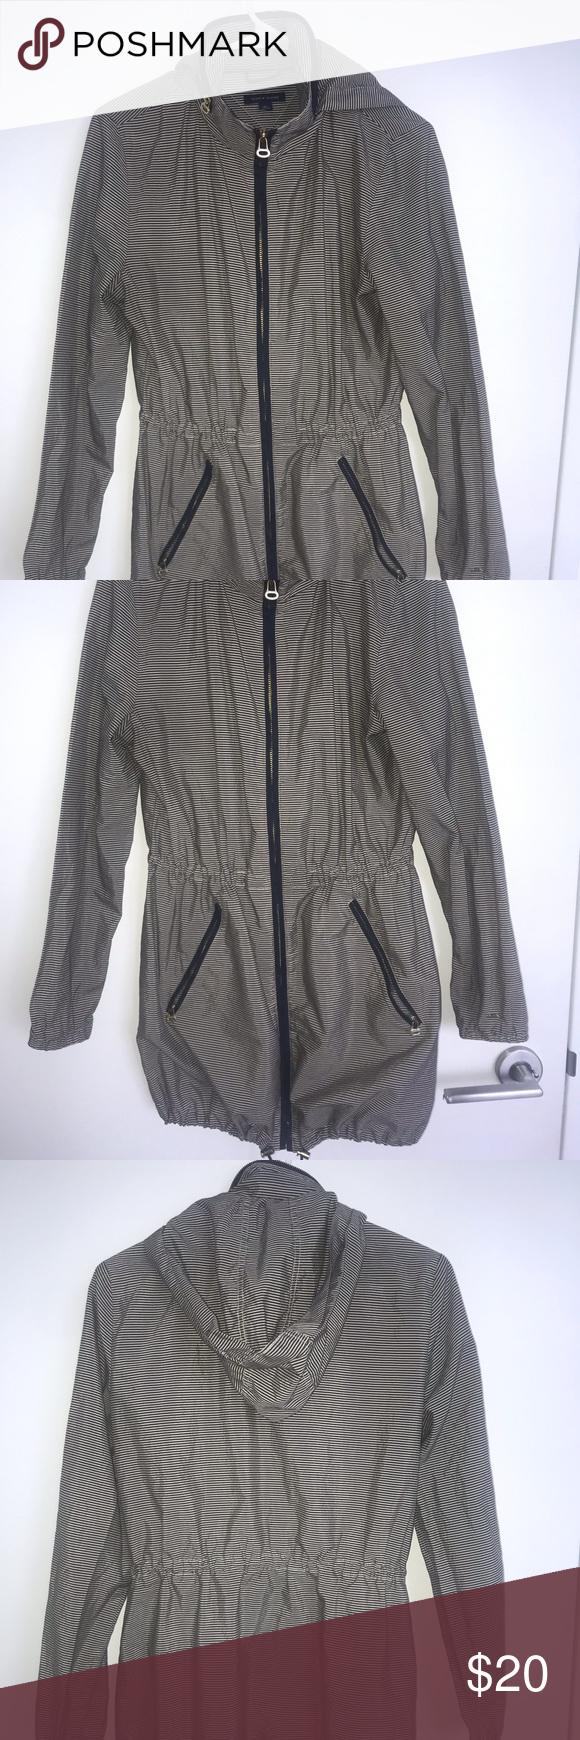 Tommy Hilfiger Striped Rain Jacket W/Hood Tommy hilfiger